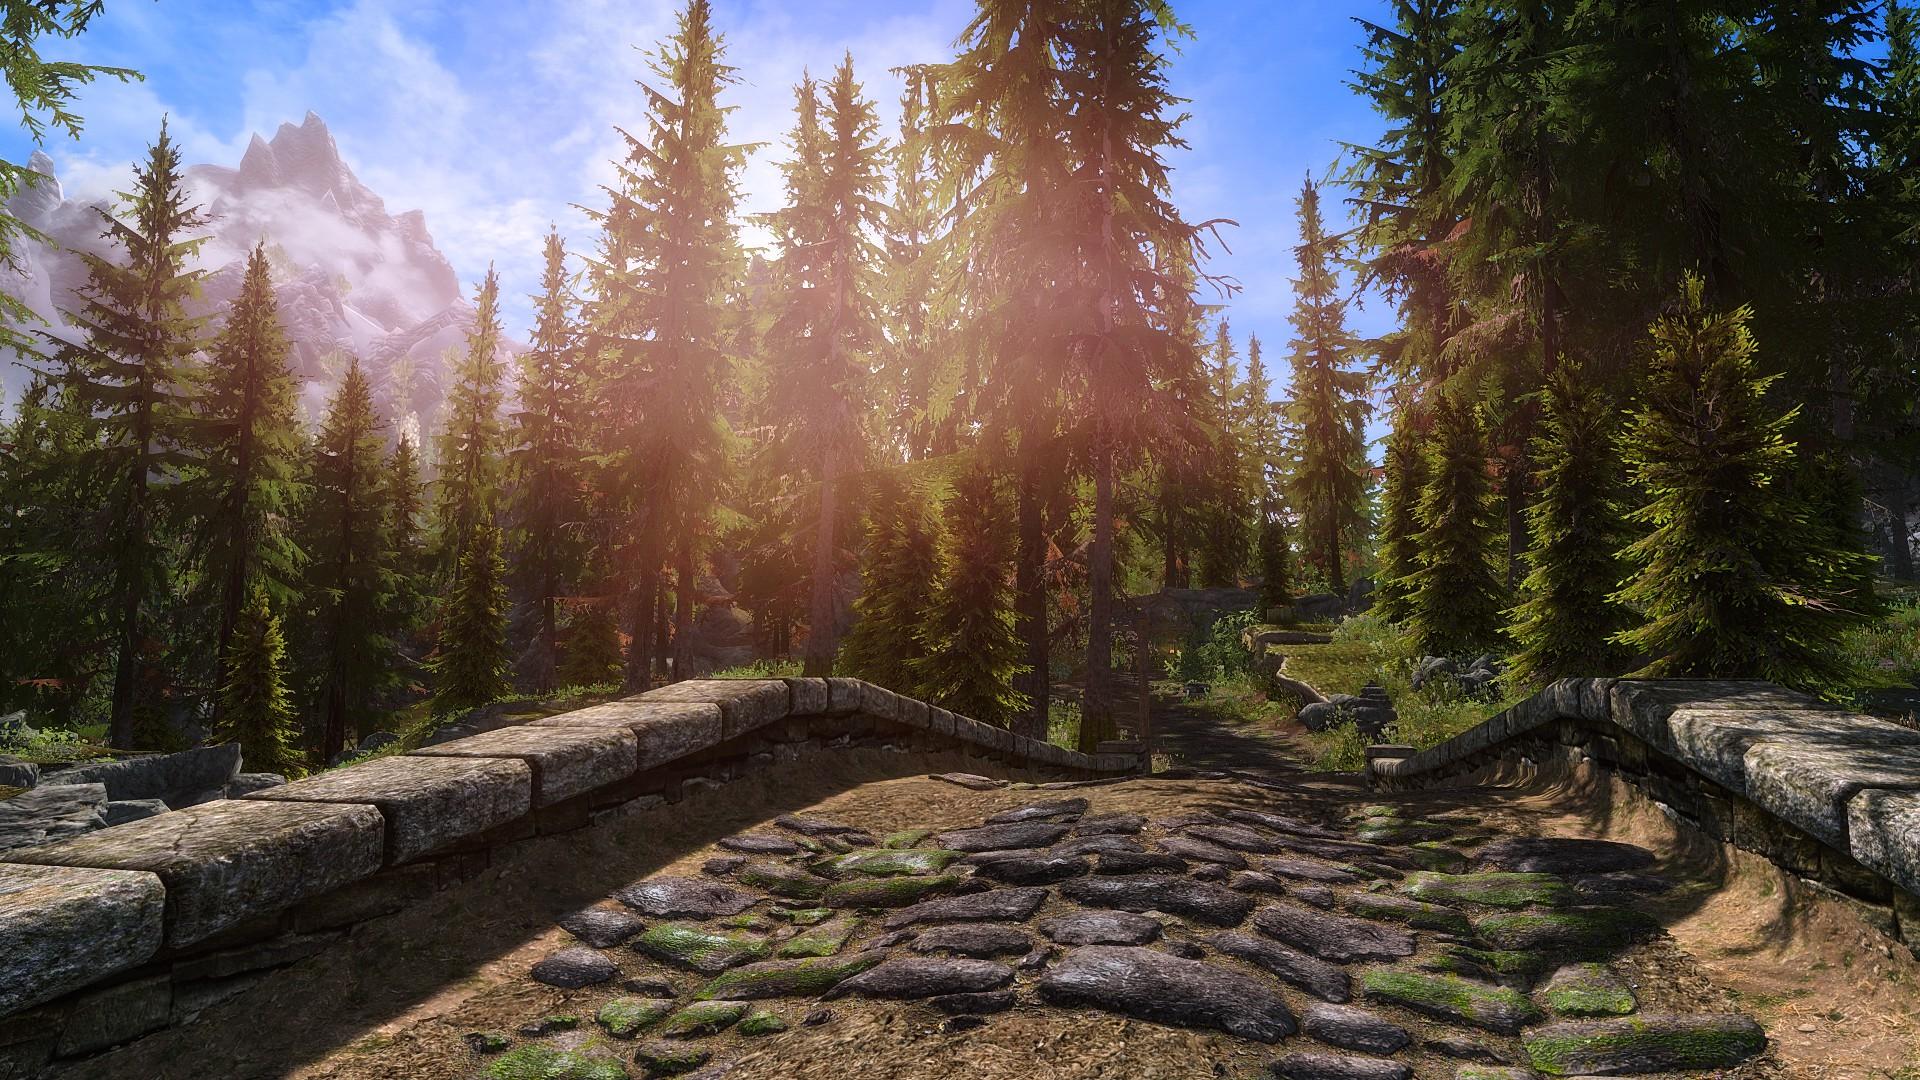 20190720202301_1.jpg - Elder Scrolls 5: Skyrim, the